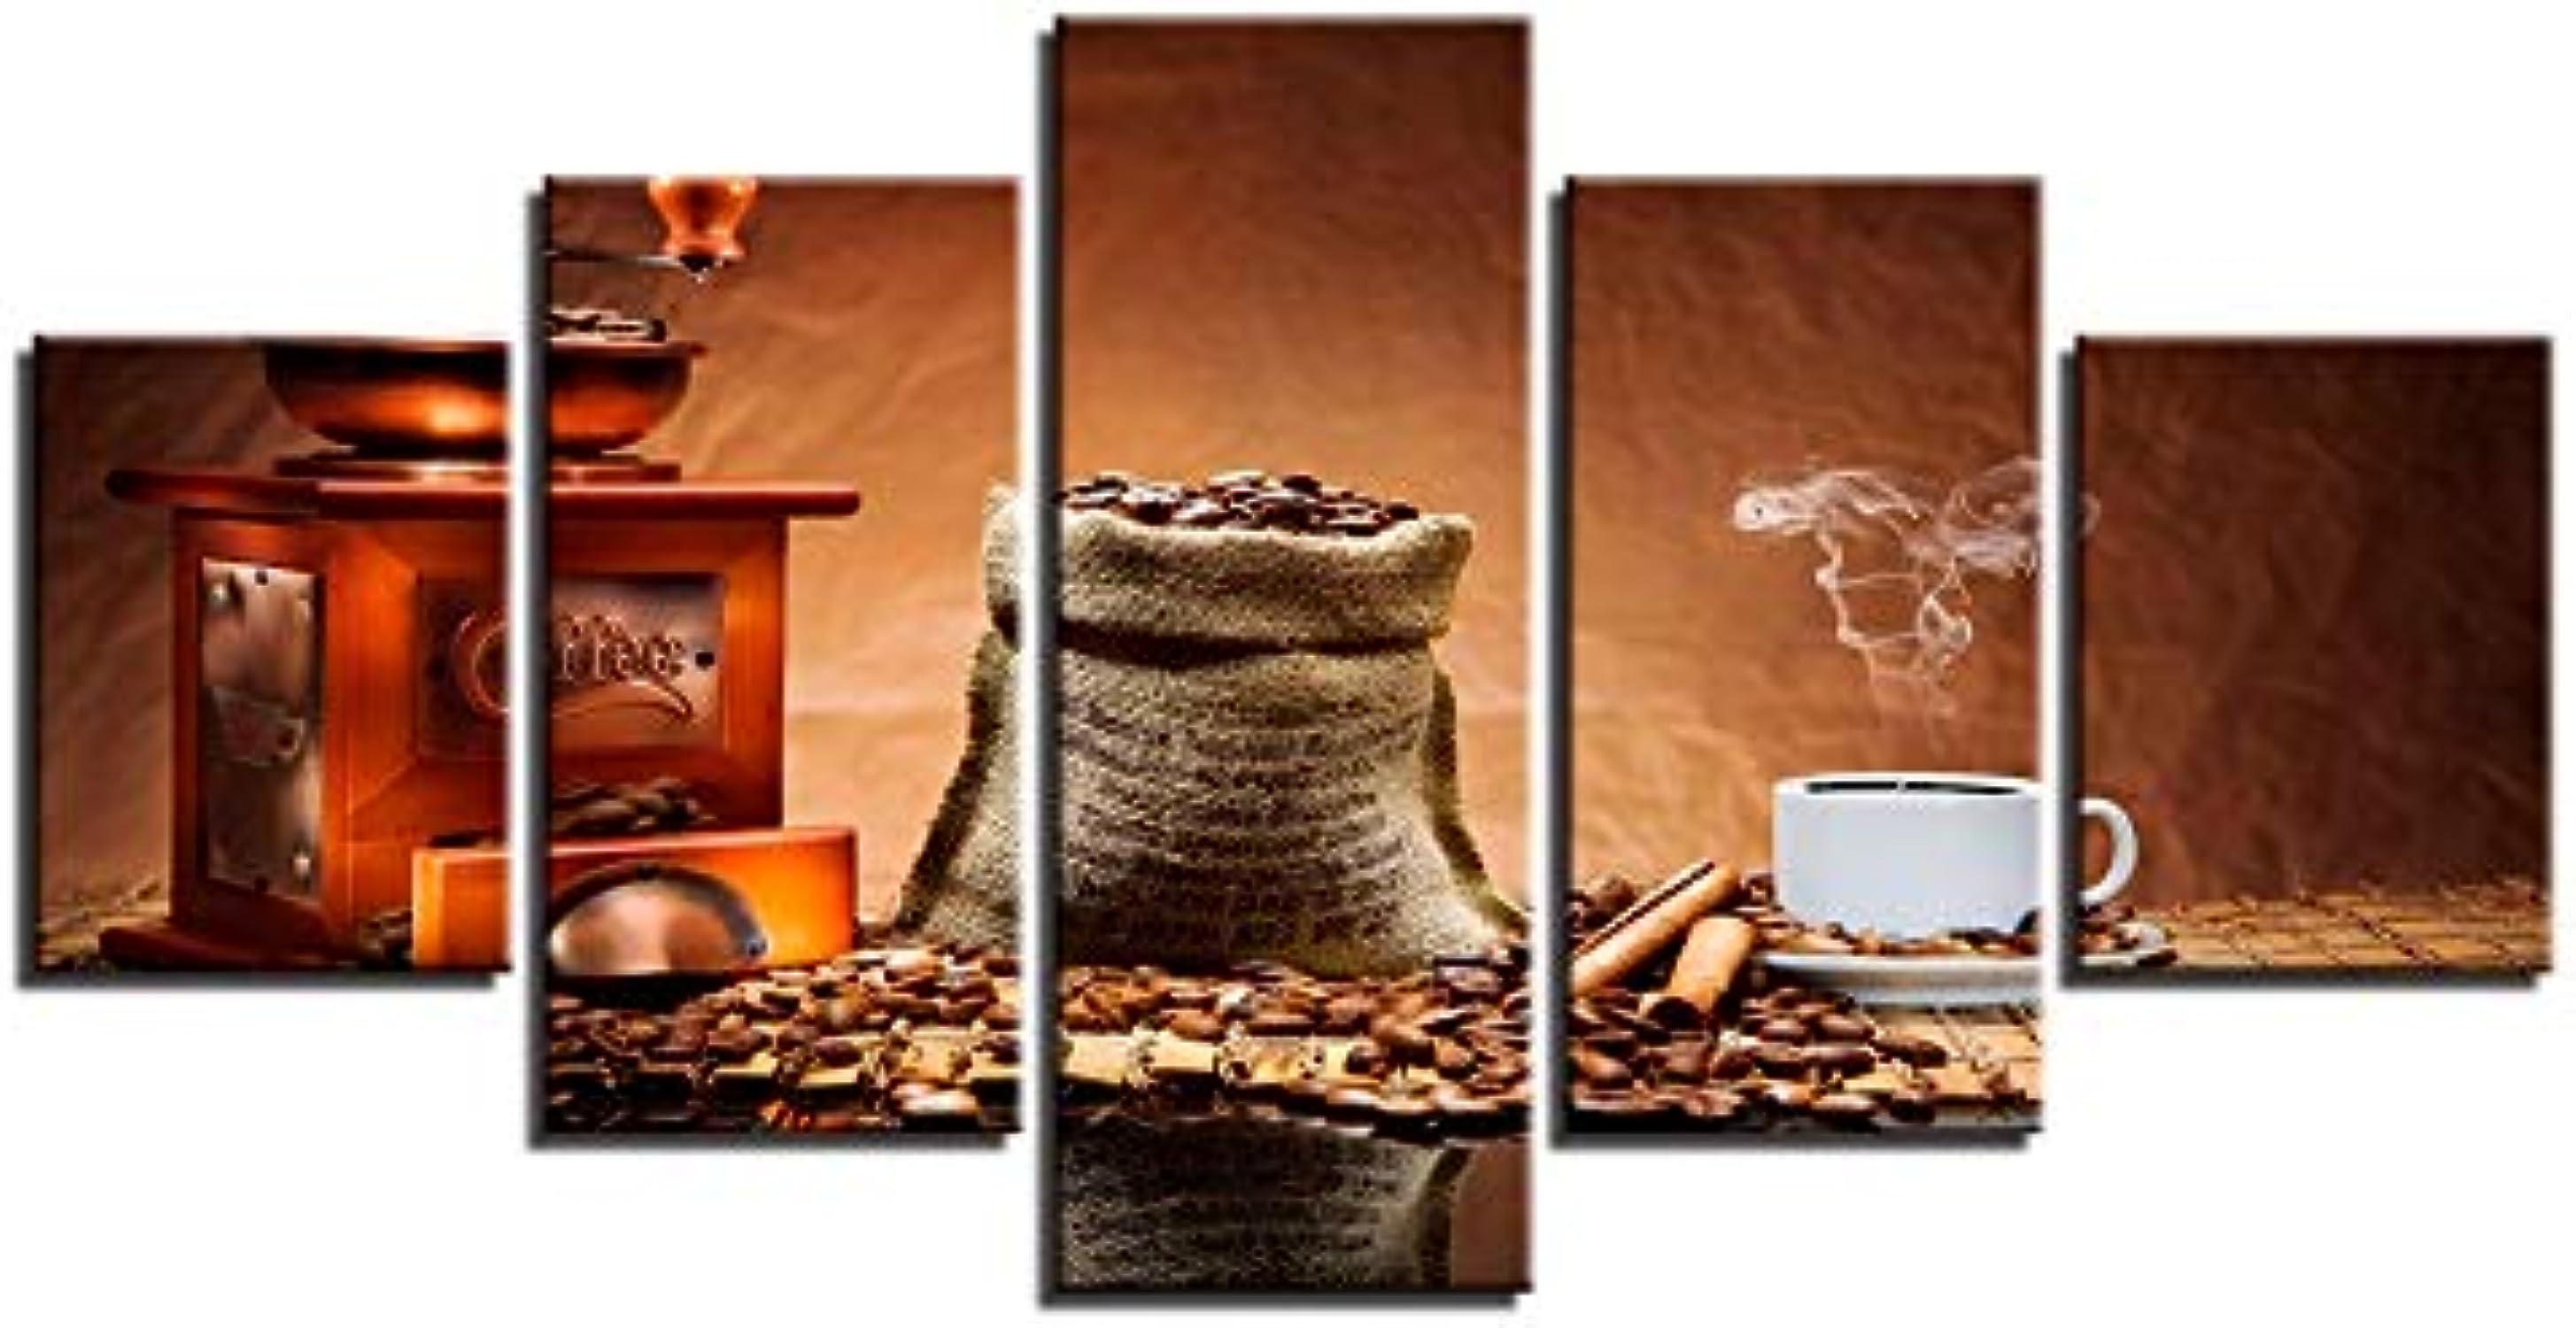 compras de moda online RMRM Imágenes de Lienzo Modular Marco de Decoración para para para el hogar Impresión HD 5 Unidades Granos de Café Pintura Café Aroma Cup Poster Restaurante Arte de Parojo 20x35cm20x45cm 20x55cm  ahorra hasta un 70%